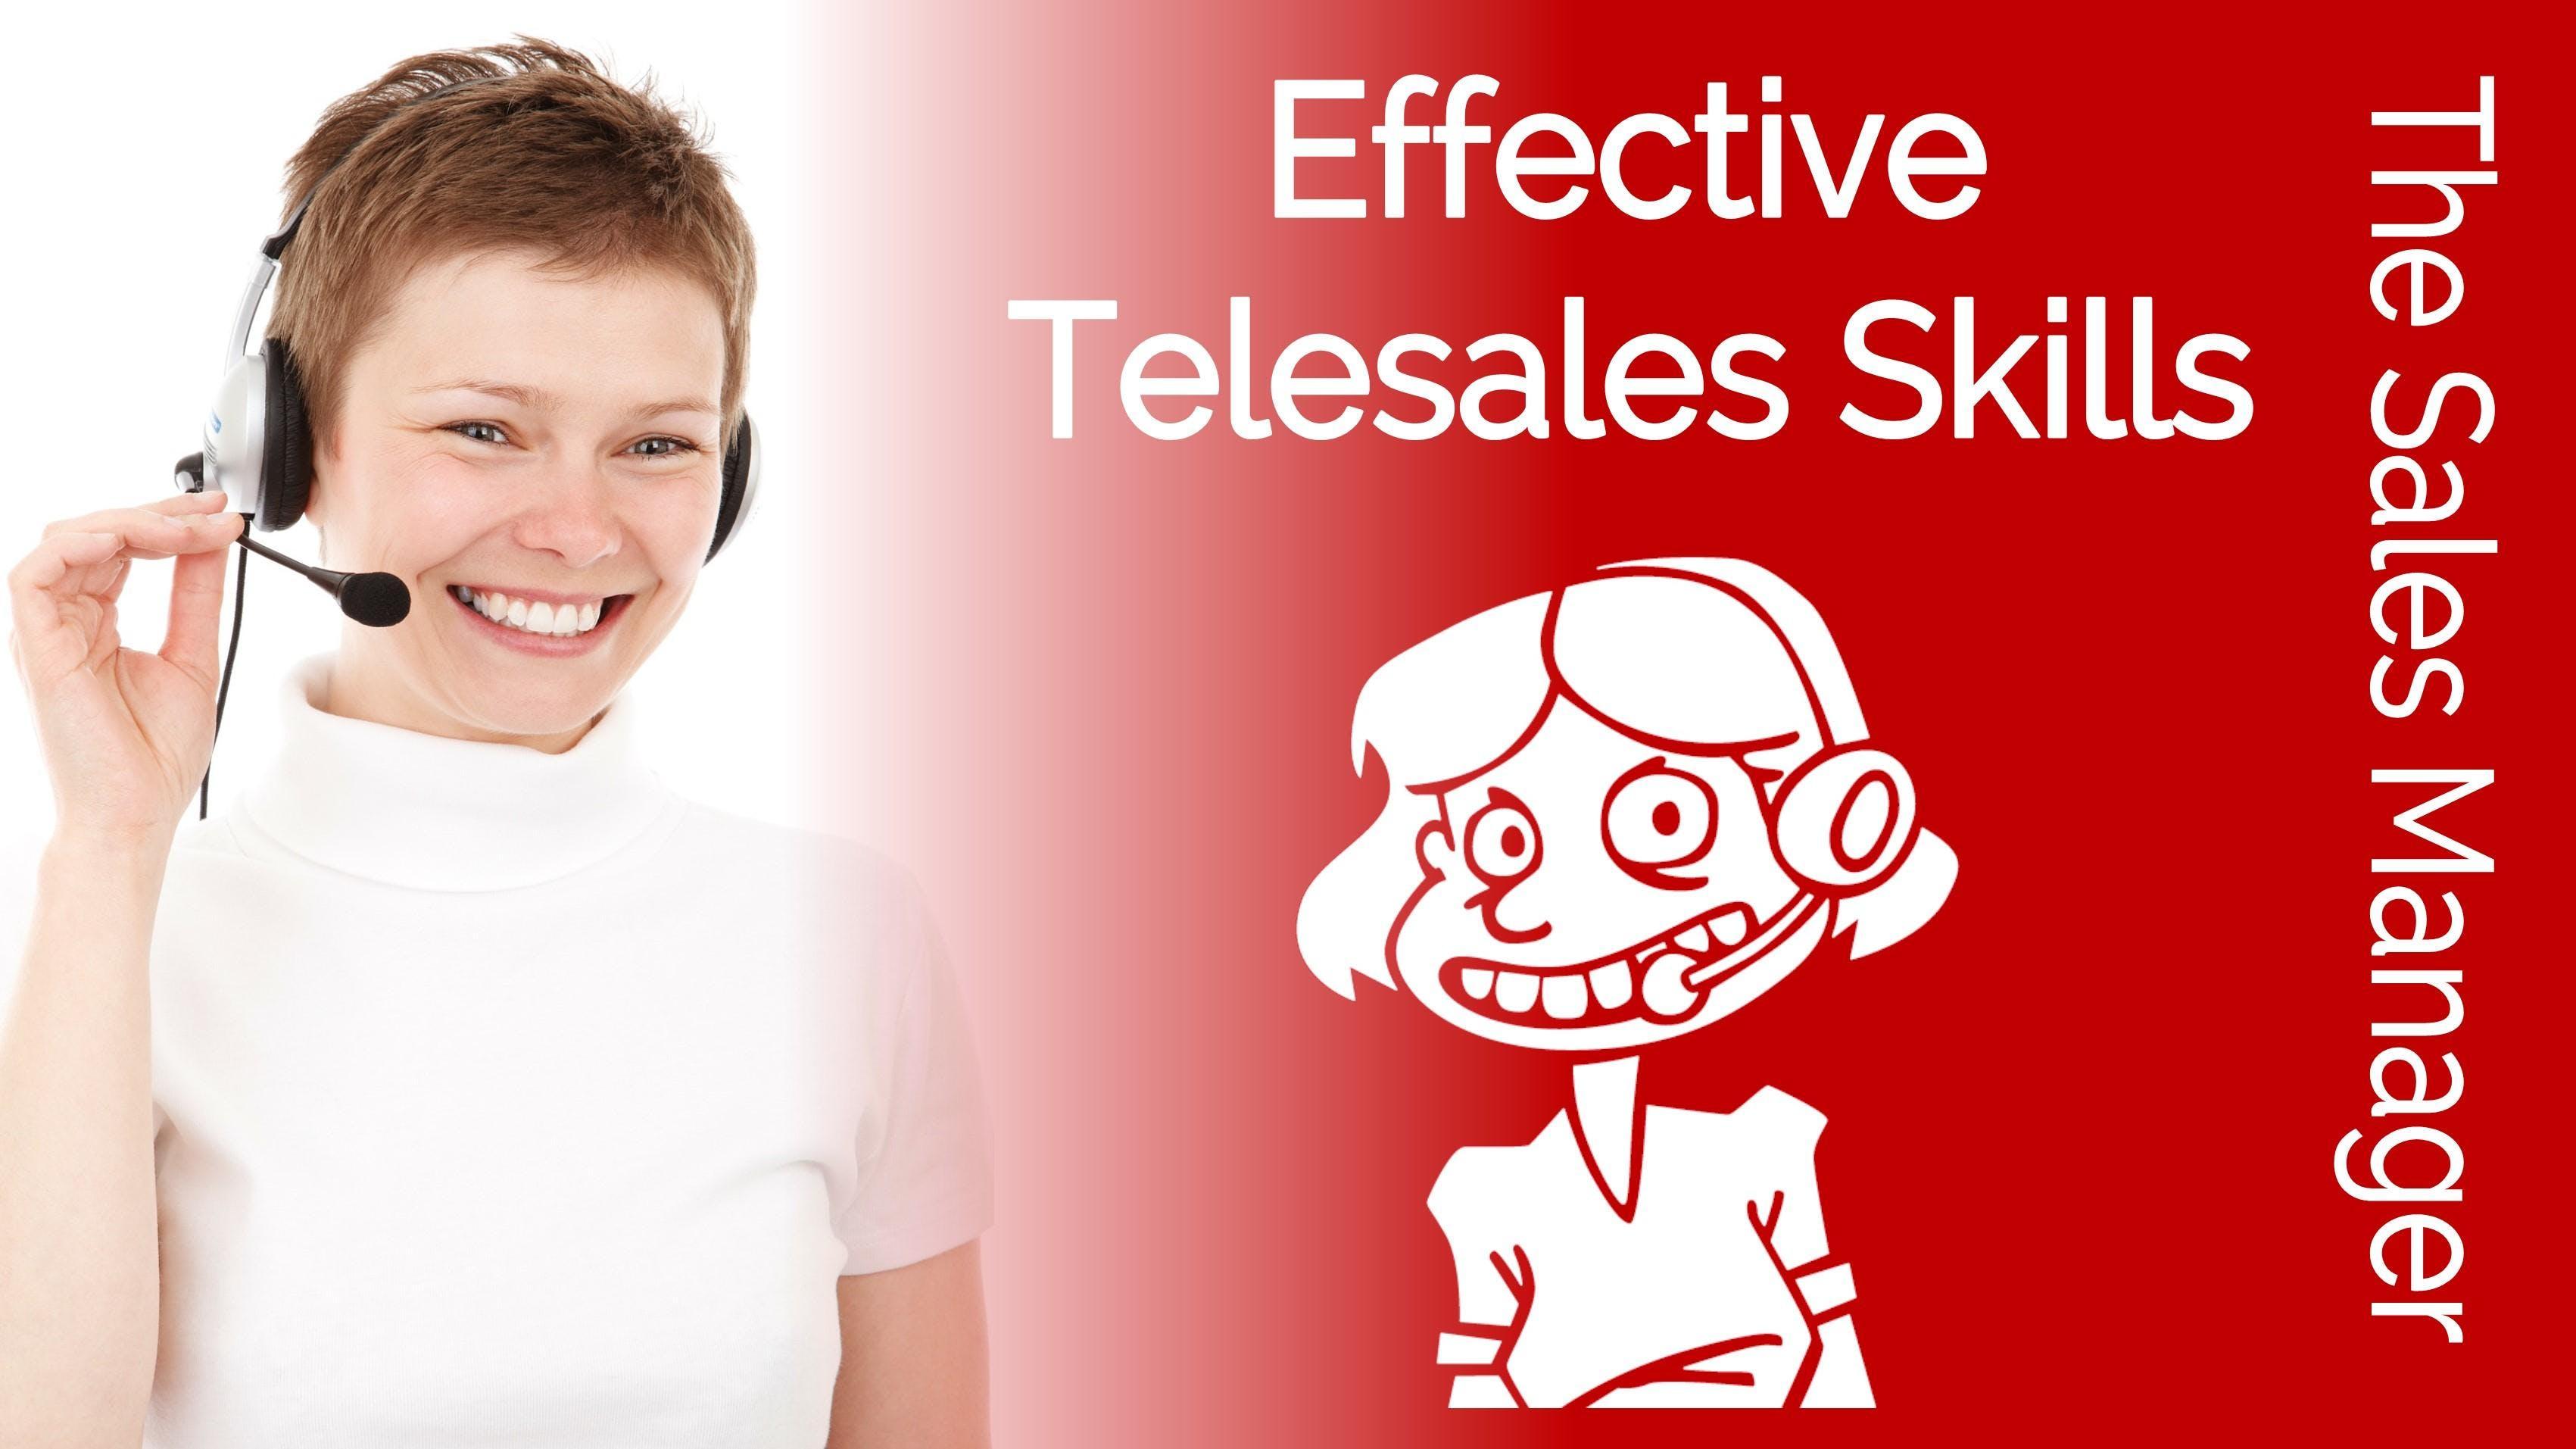 Effective Telesales Skills